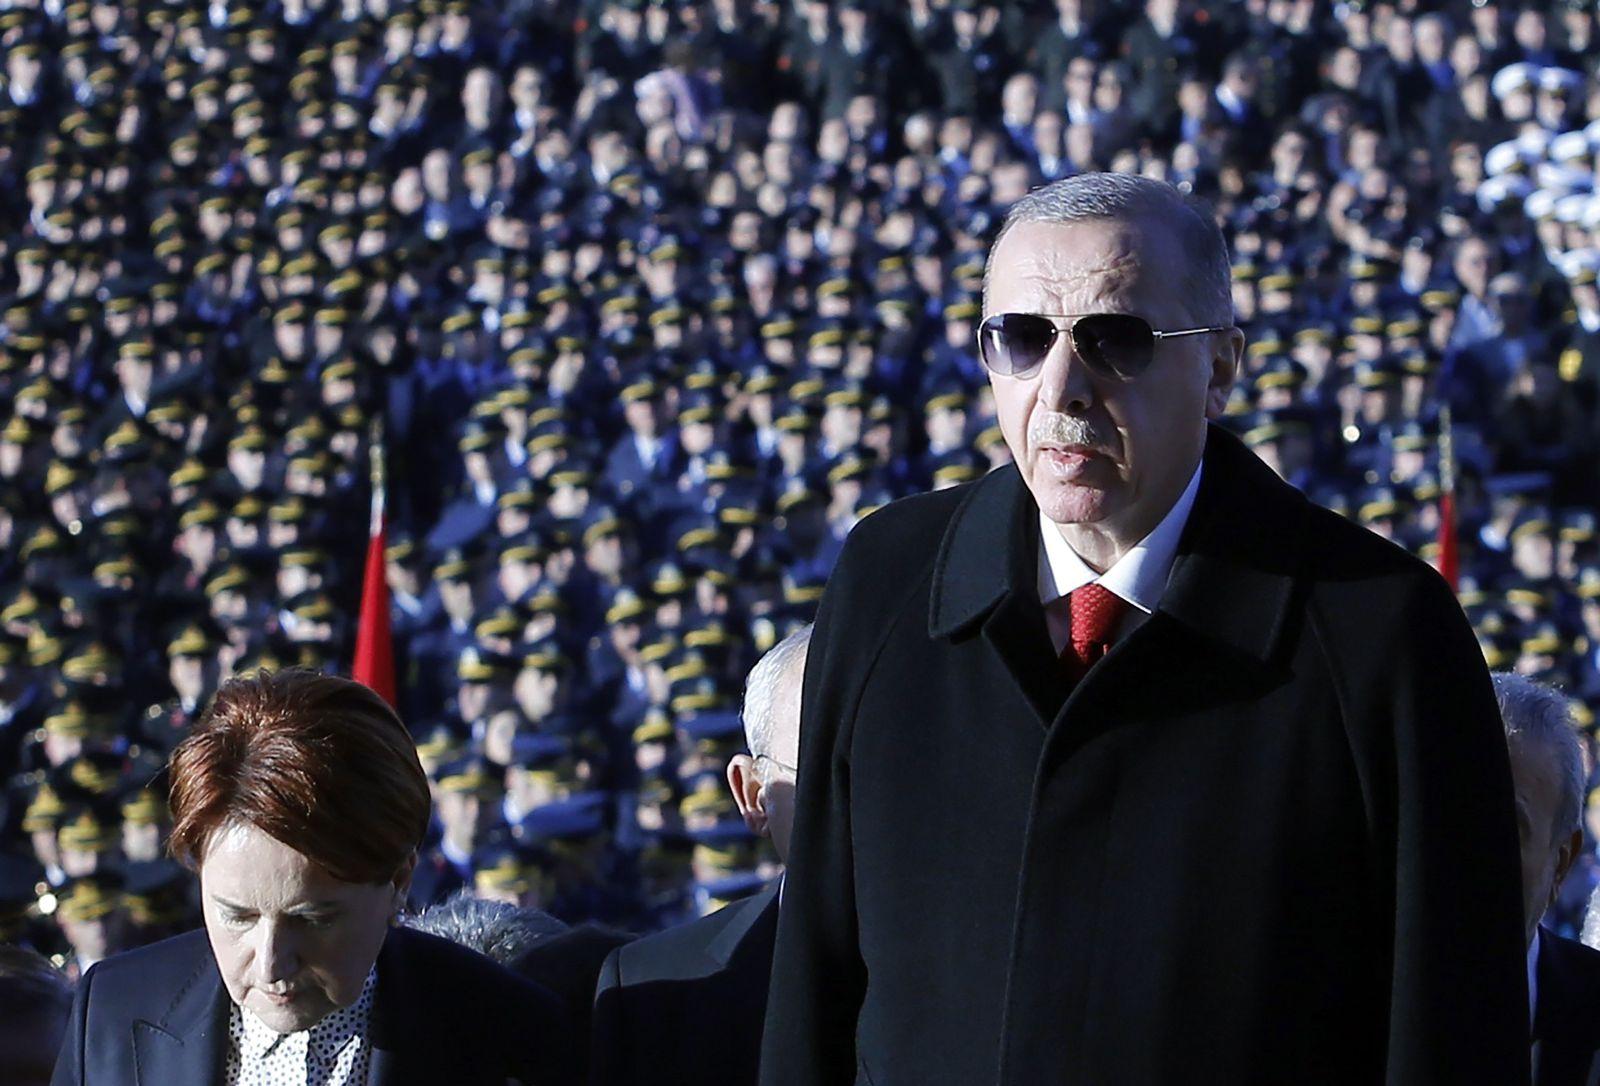 TURKEY-ATATURK DEATH ANNIVERSARY